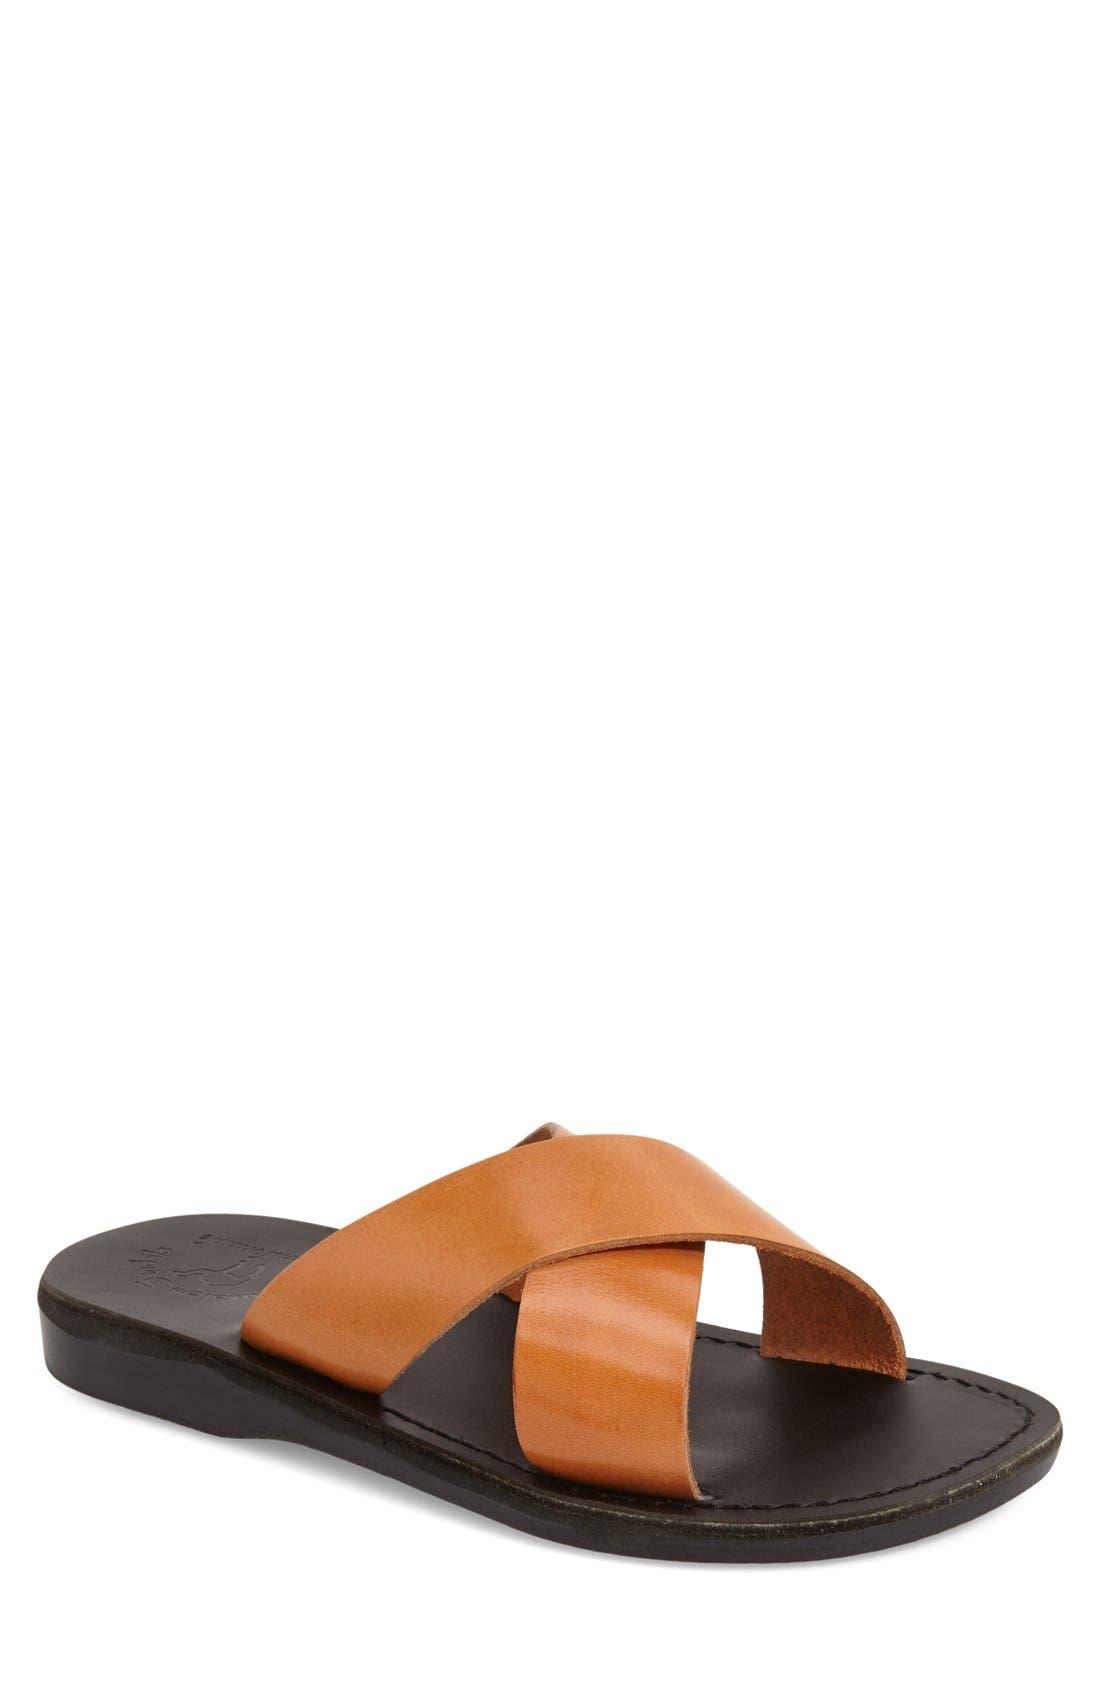 'Elan' Slide Sandal,                         Main,                         color, TAN LEATHER/ BLACK